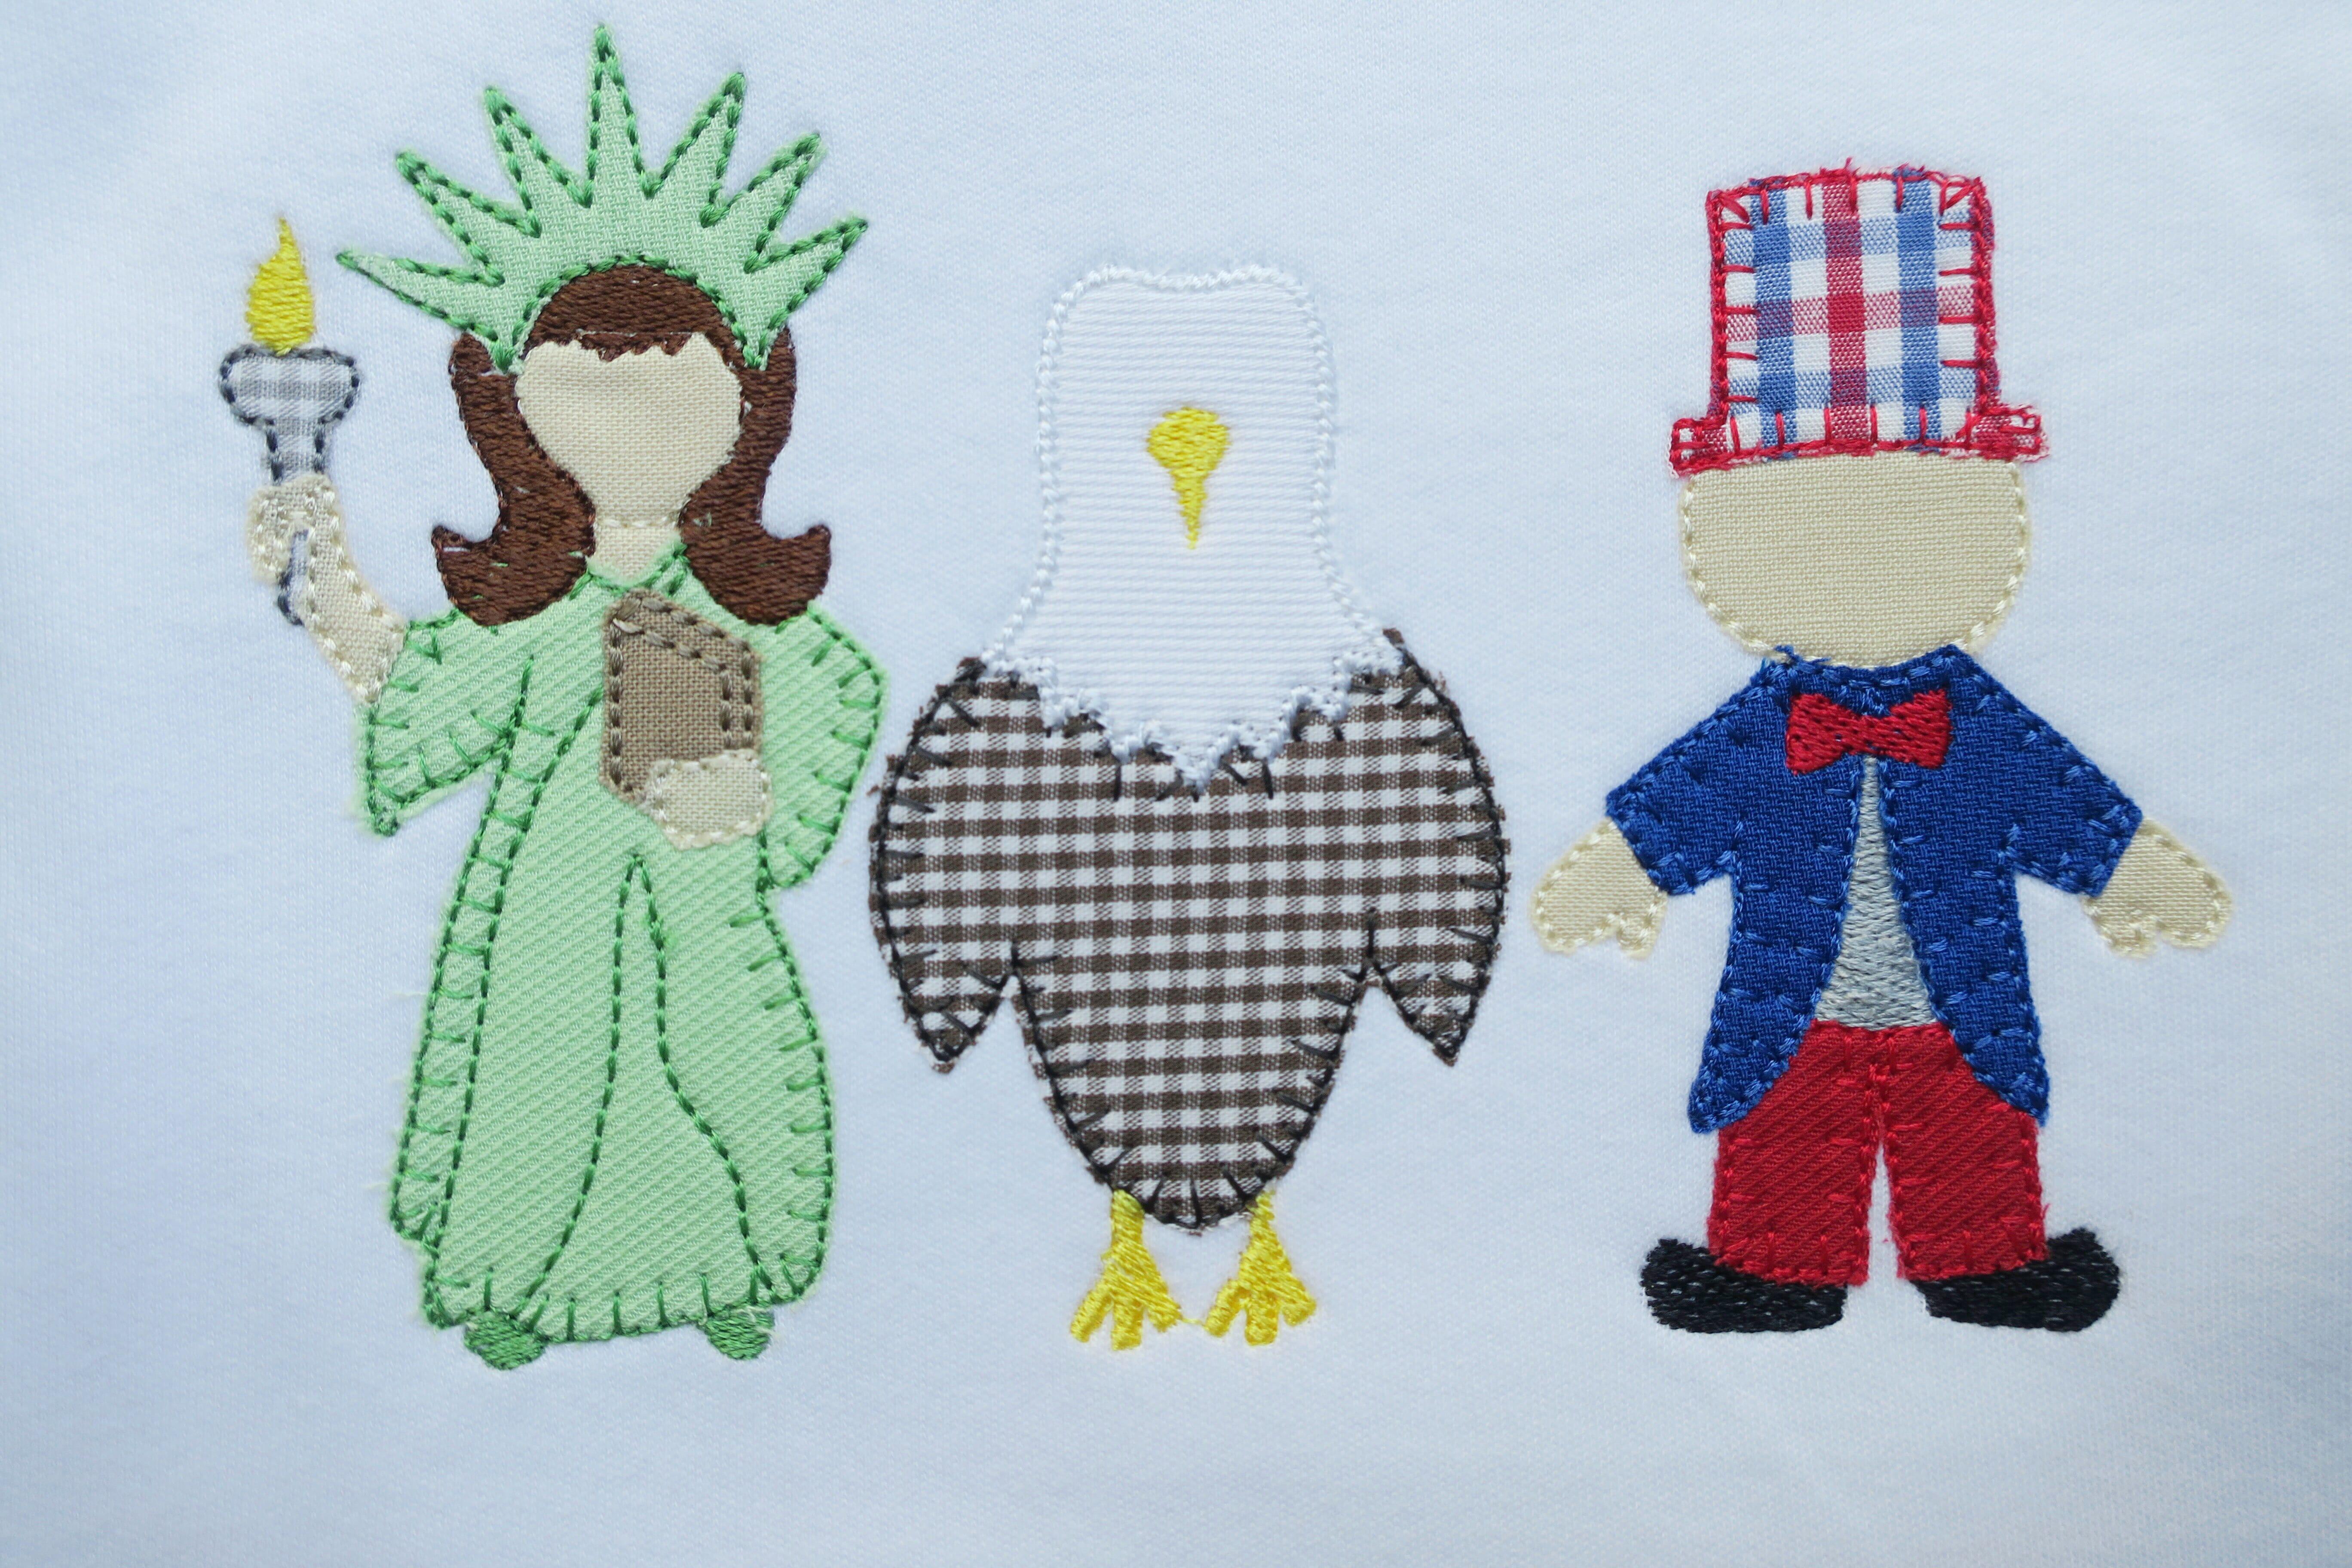 Patriotic trio embroidery design embroidery design cosellie